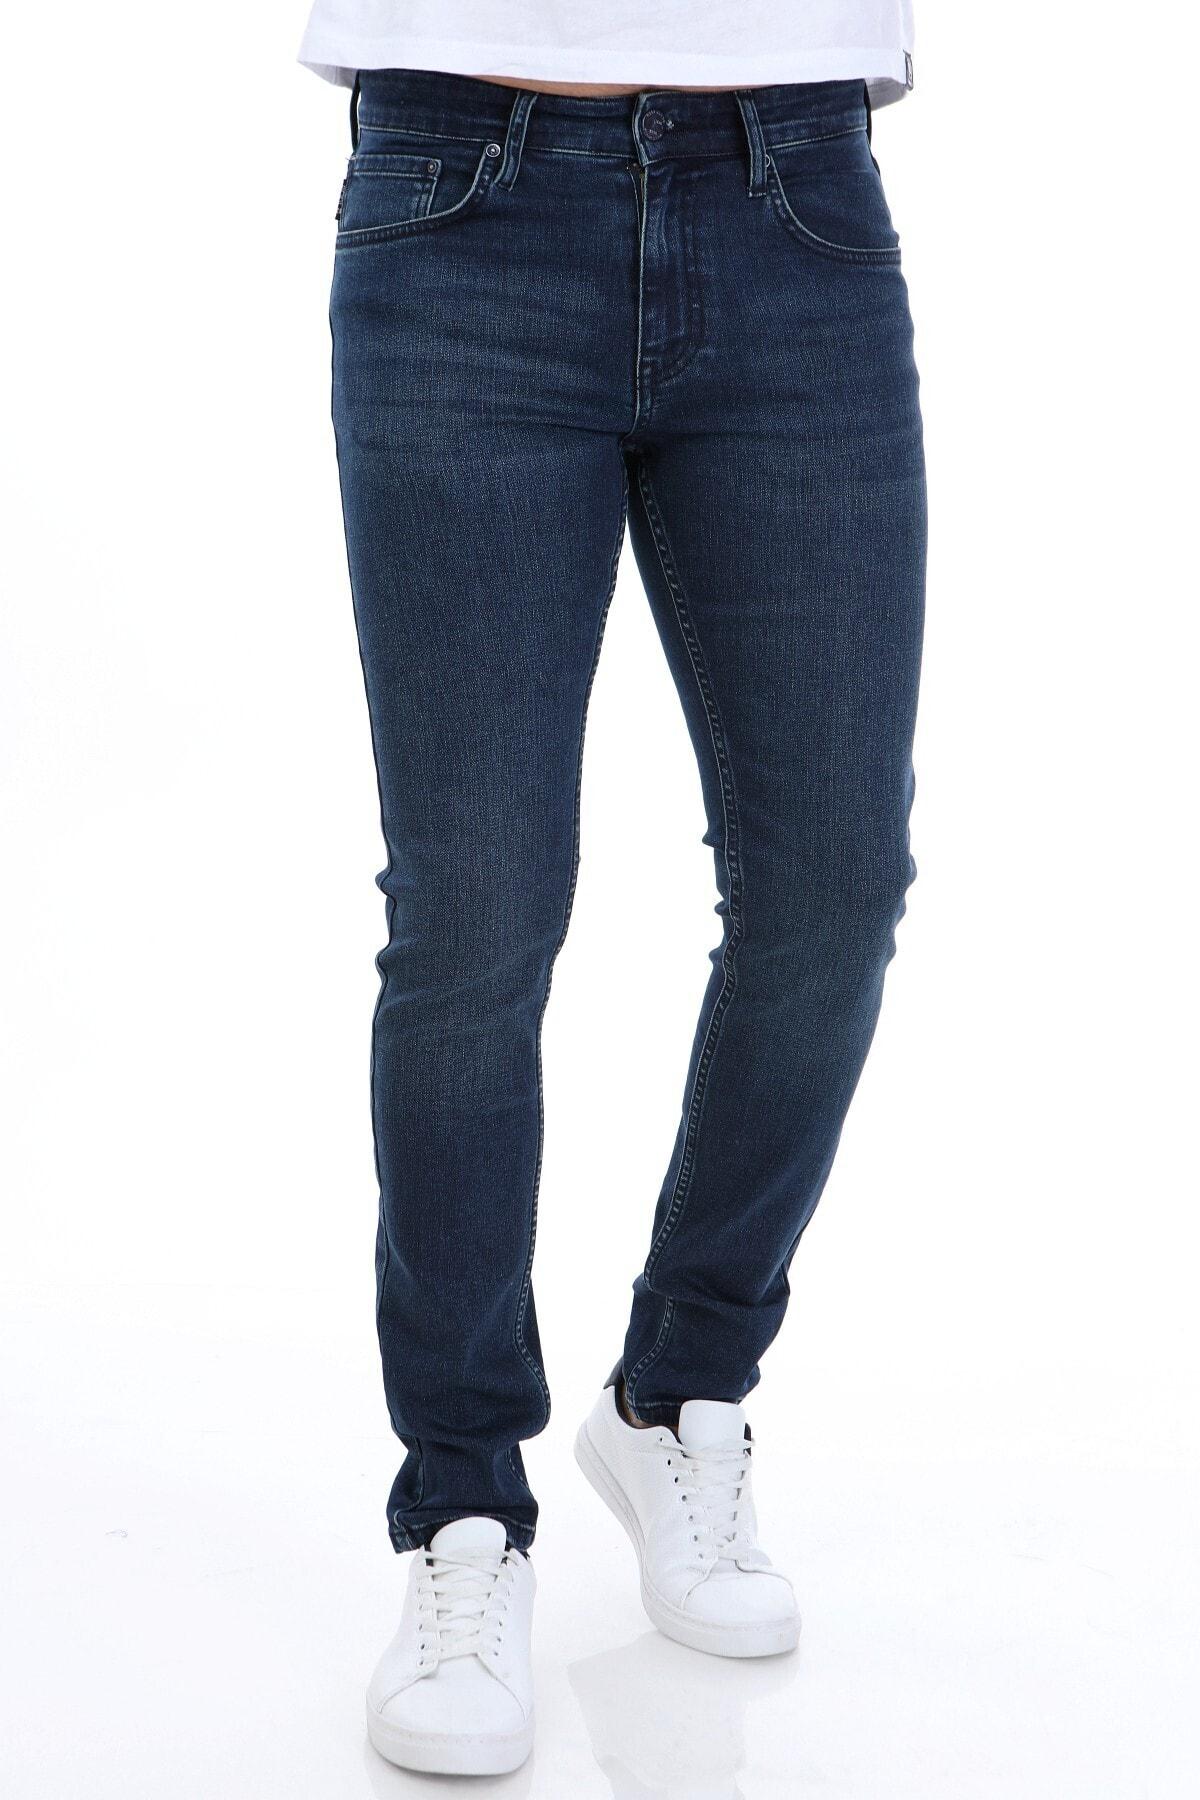 Rodi Jeans Rodi Rd21ke011303 Tint Mavi Danny 102 Jean Jean 2